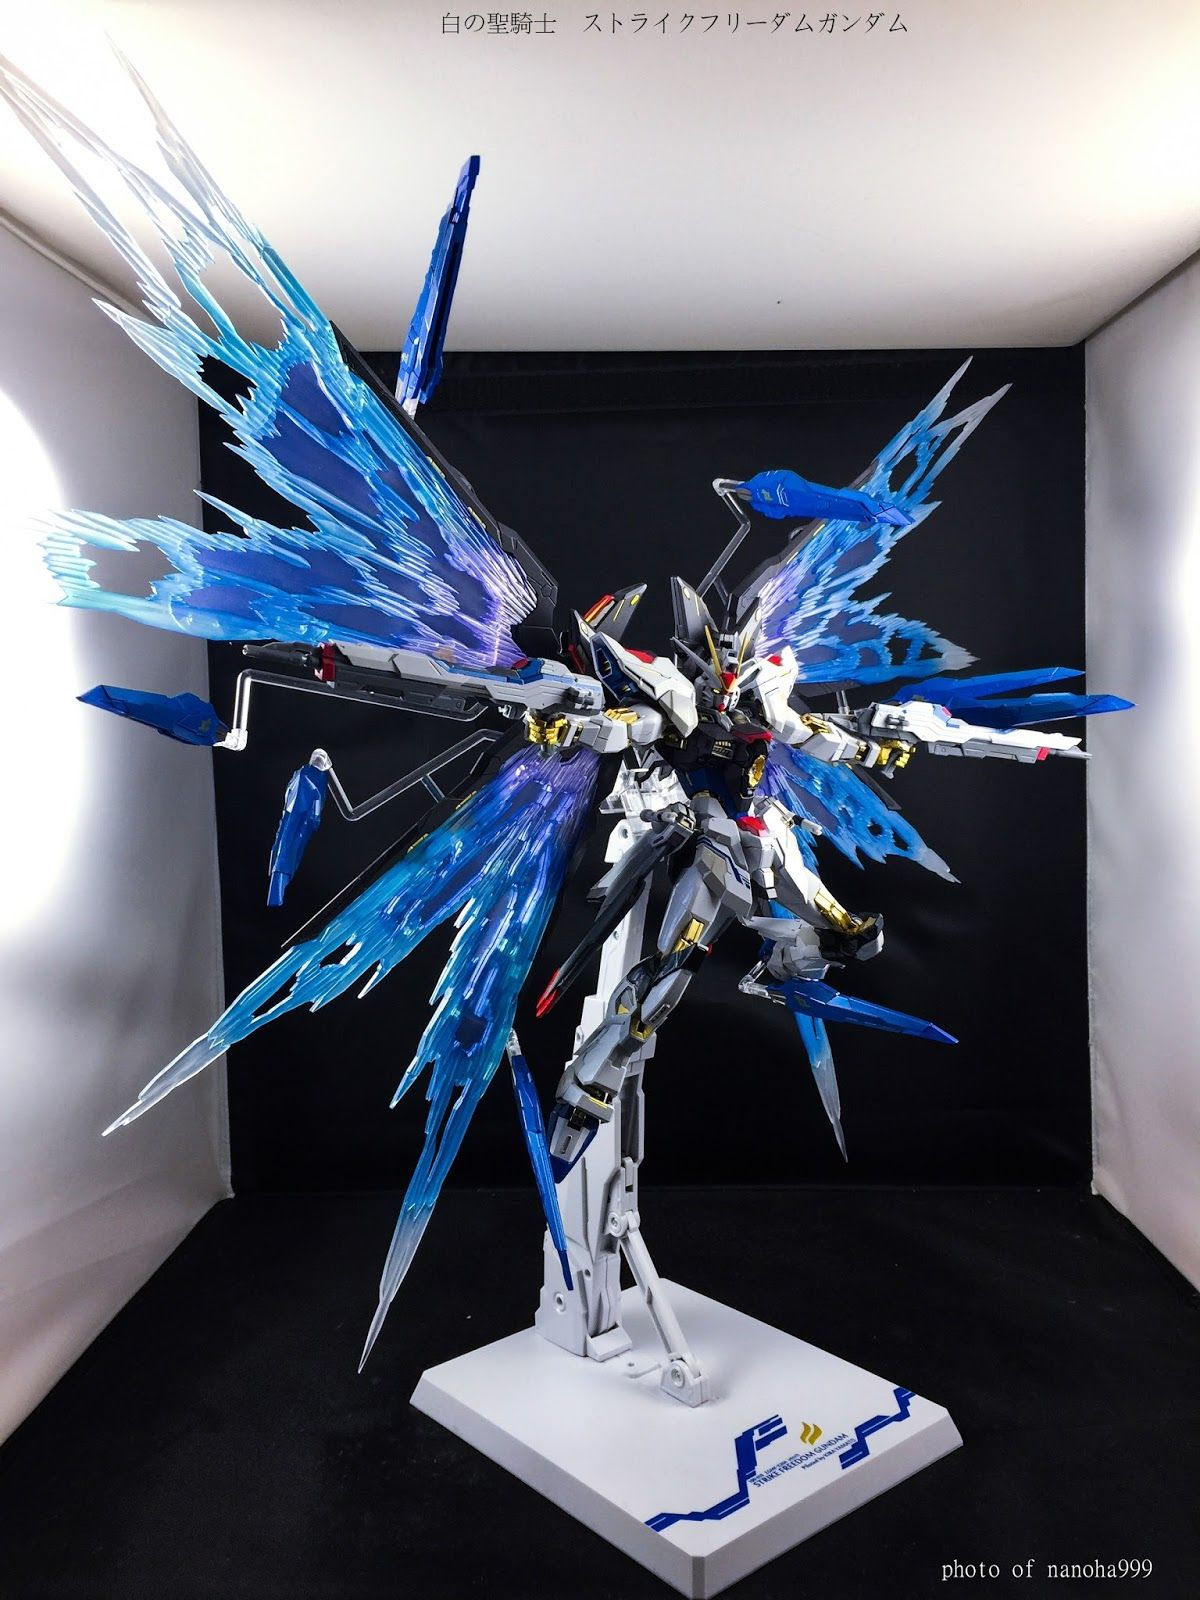 Gundam Guy Metal Build Strike Freedom Gundam Wing Of Light Effect Part Set Review Images Gundam Wing Gundam Gundam Model